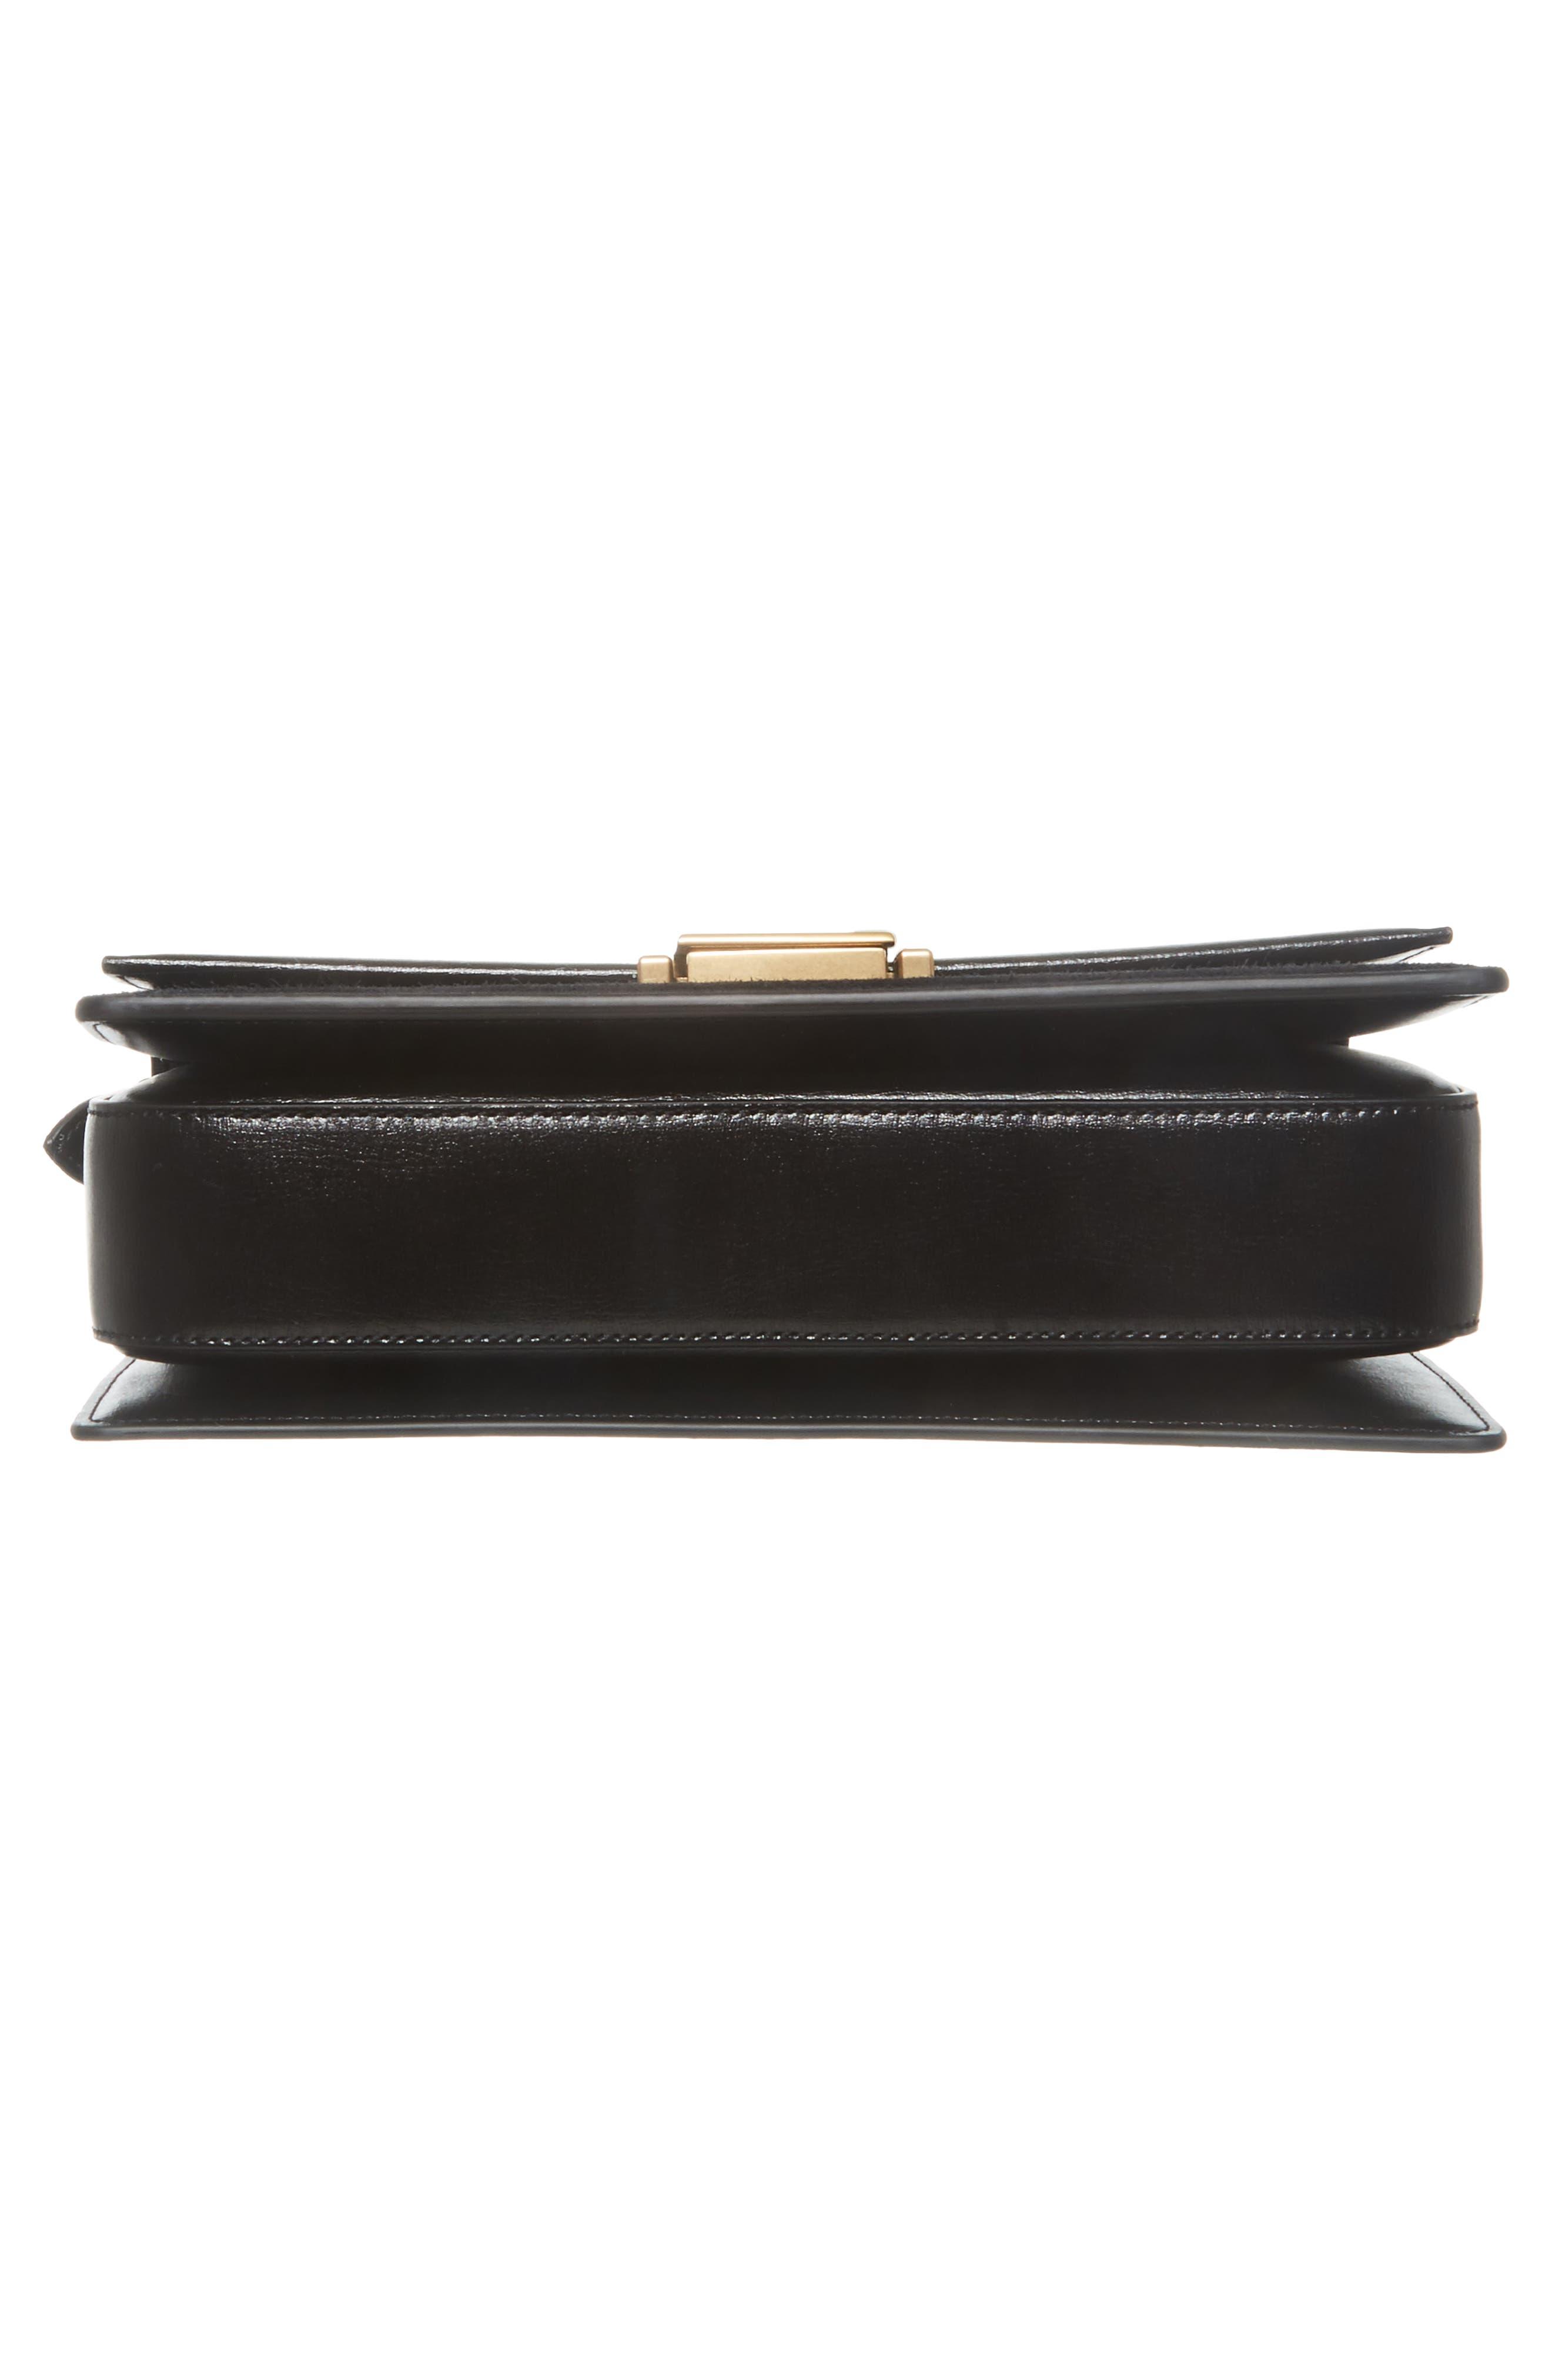 Medium Bellechasse Suede & Leather Shoulder Bag,                             Alternate thumbnail 6, color,                             NOIR